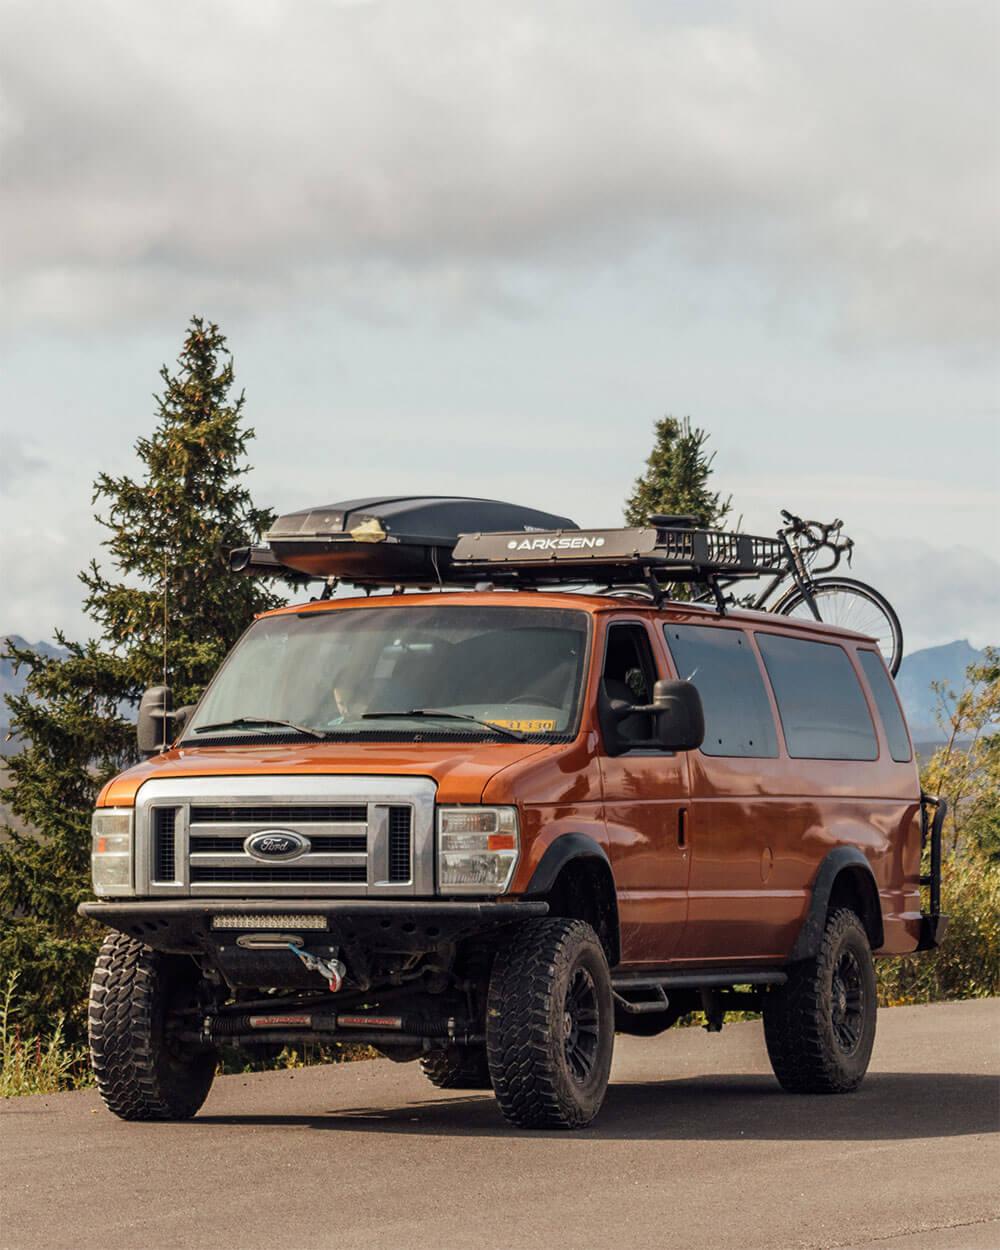 Lifted Ford E350 Camper van in Alaska